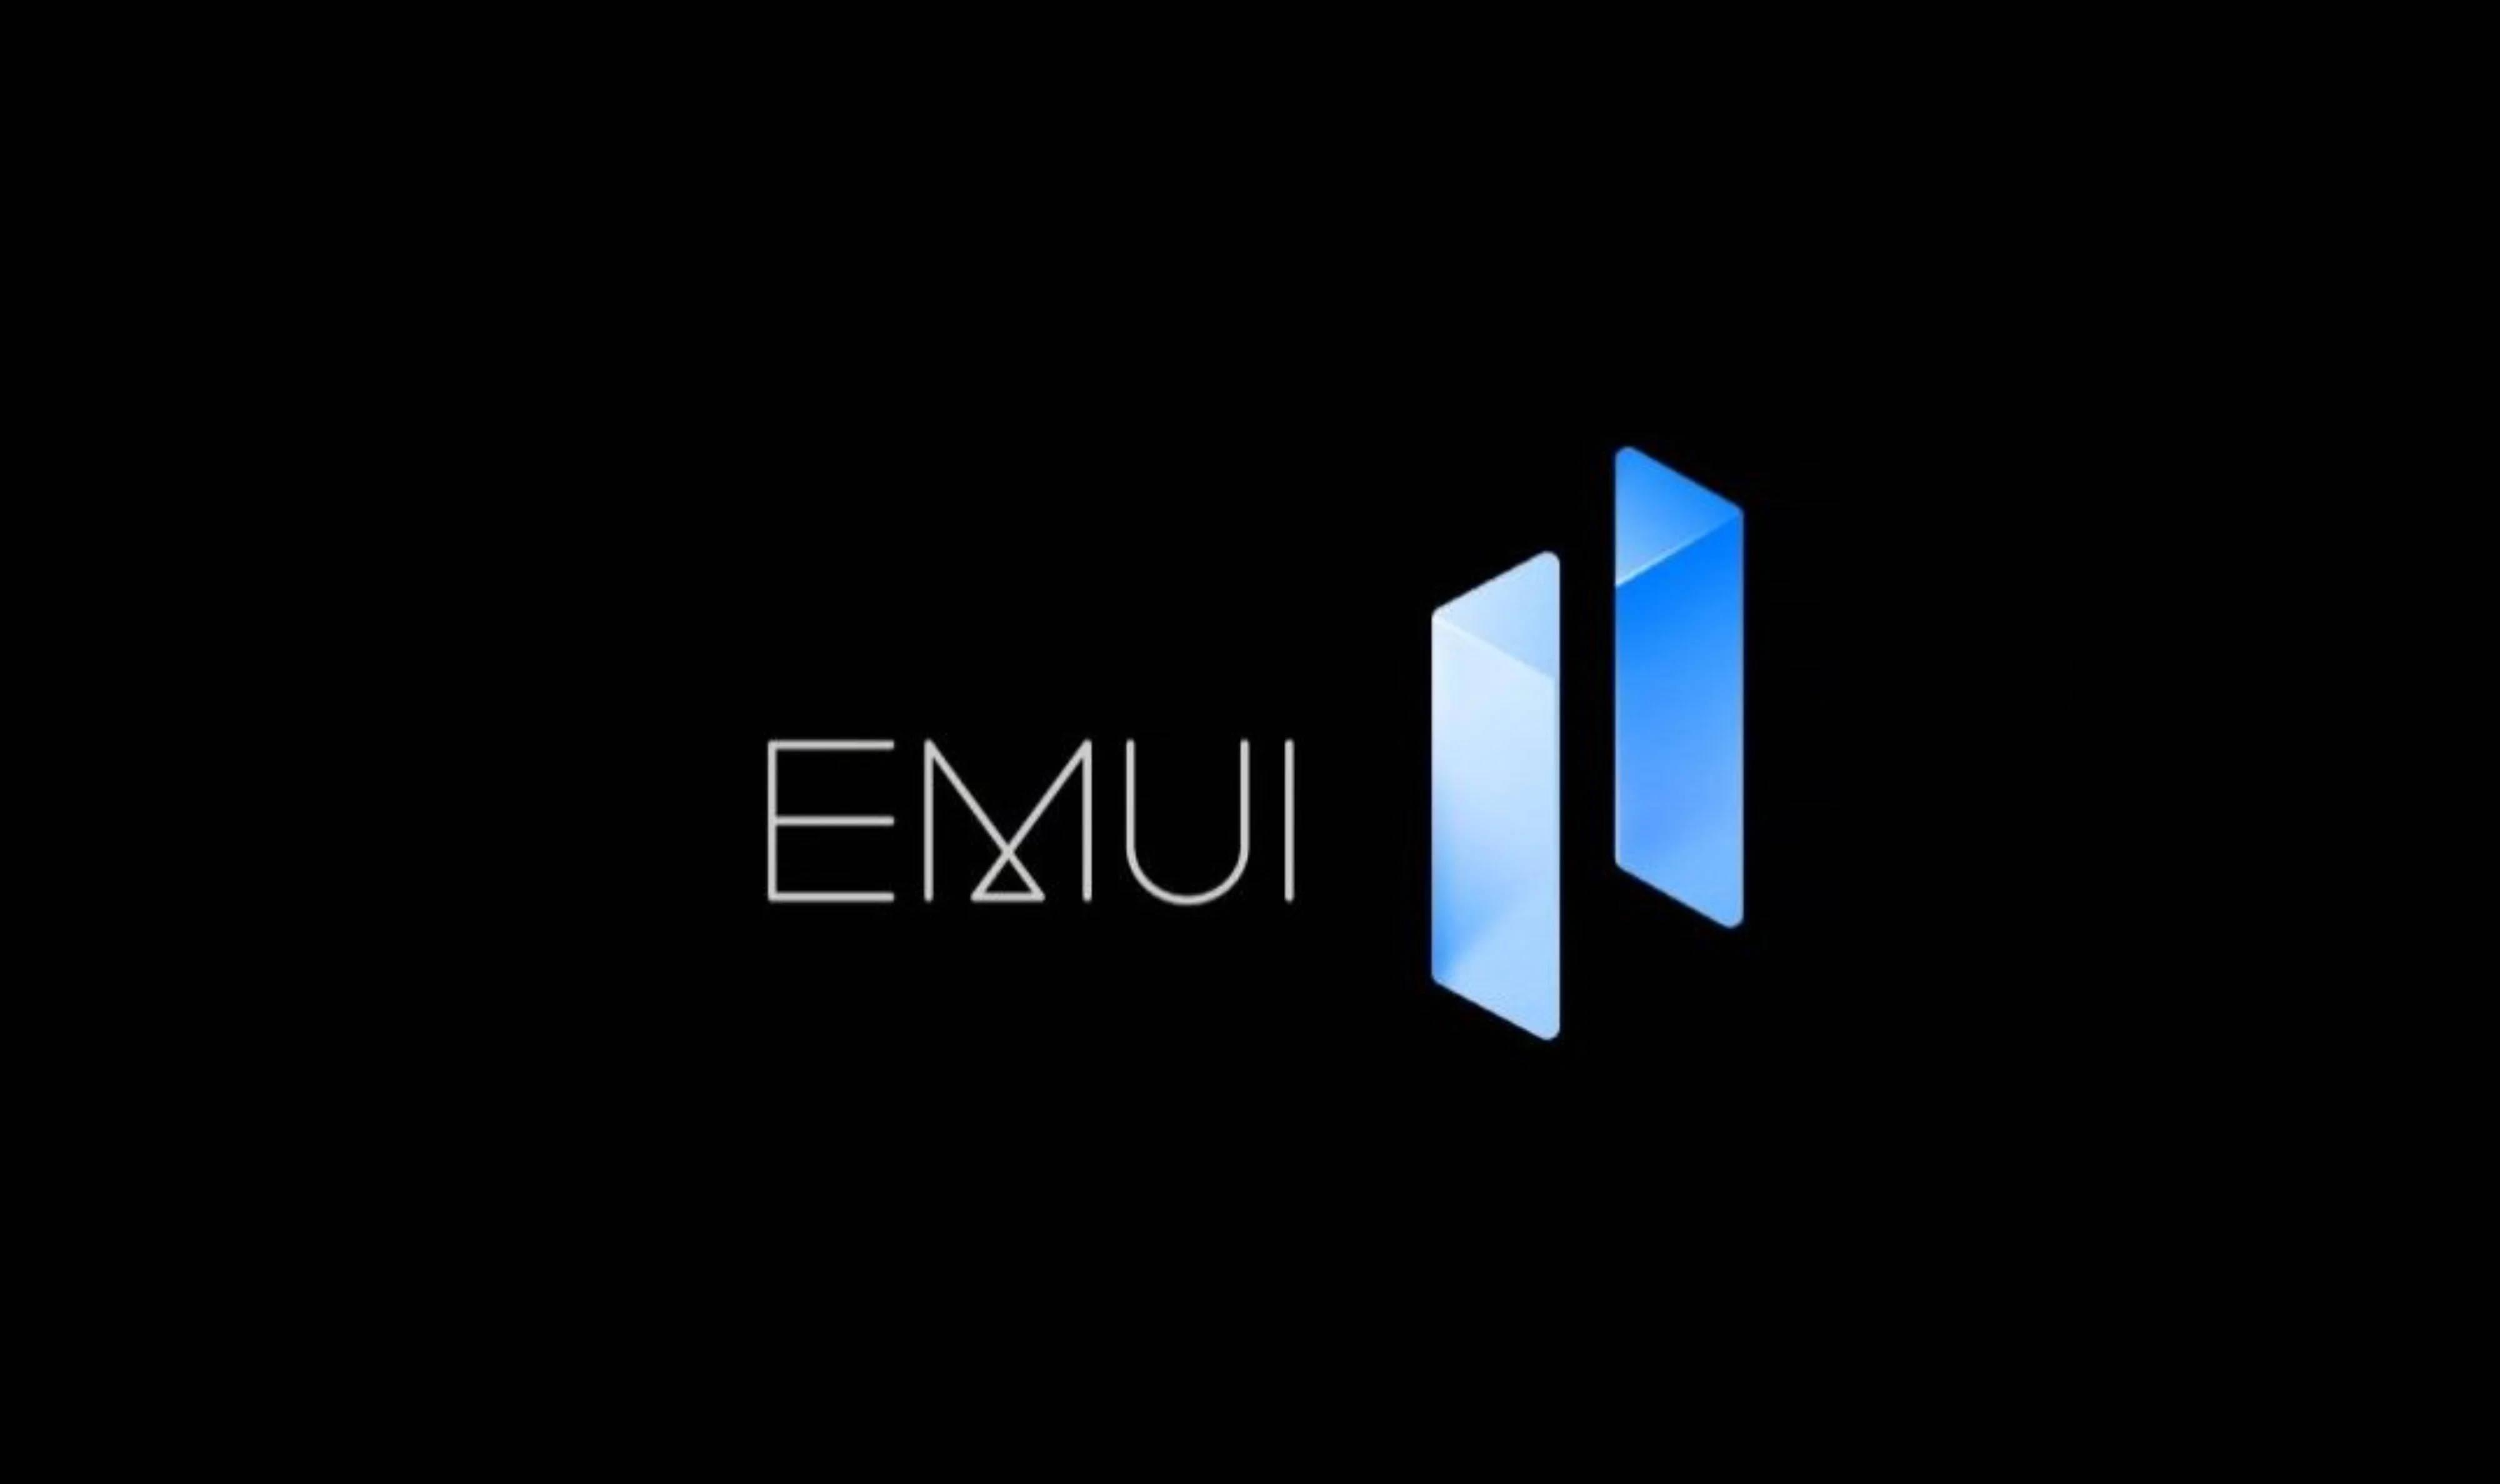 aktualizacja EMUI 11 beta Huawei Mate 20 Pro Magic UI 4.0